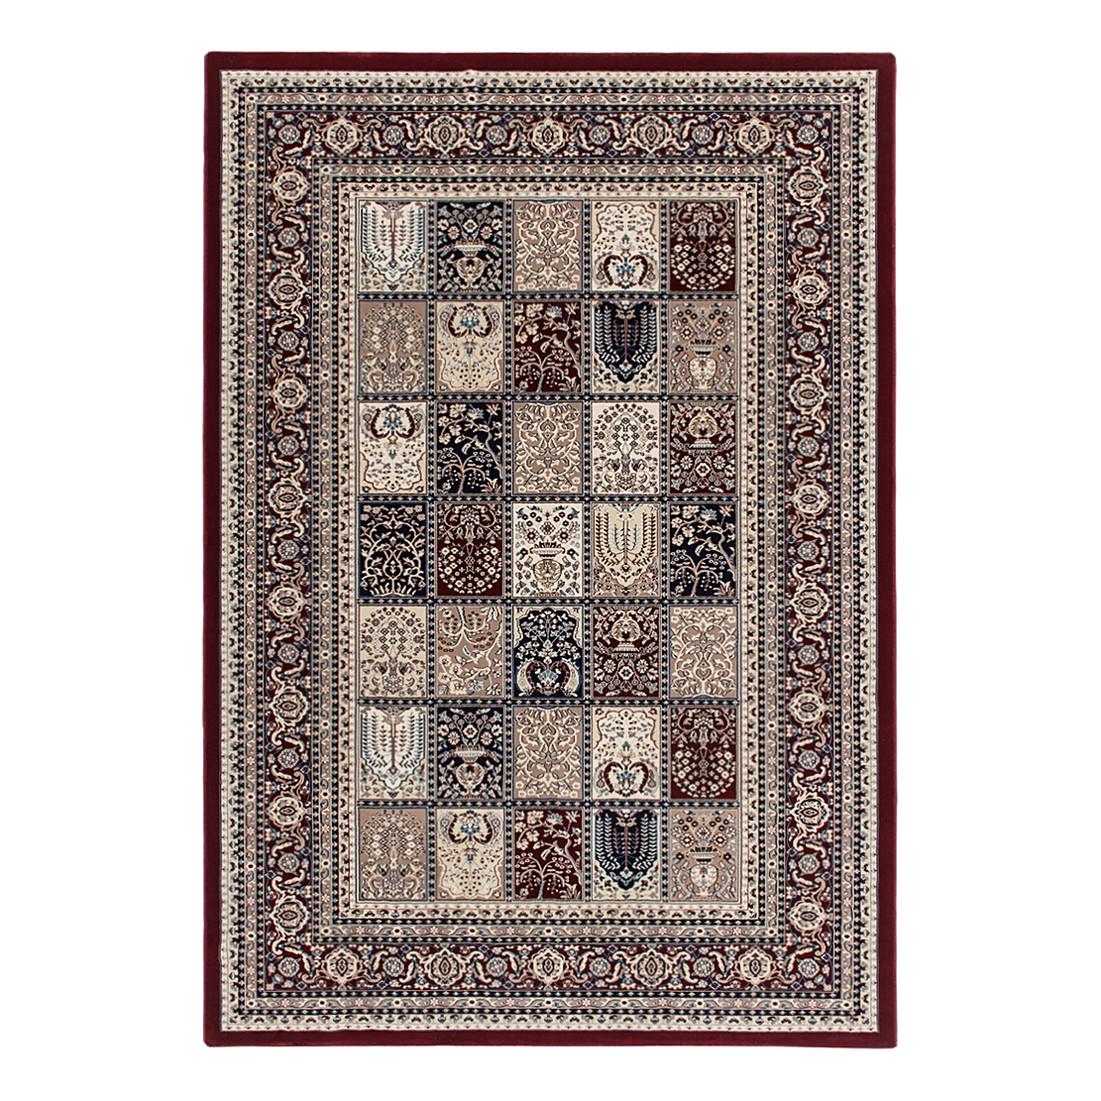 Teppich Tunisia – Ariana – Rot – 80 x 150 cm, Kayoom günstig kaufen